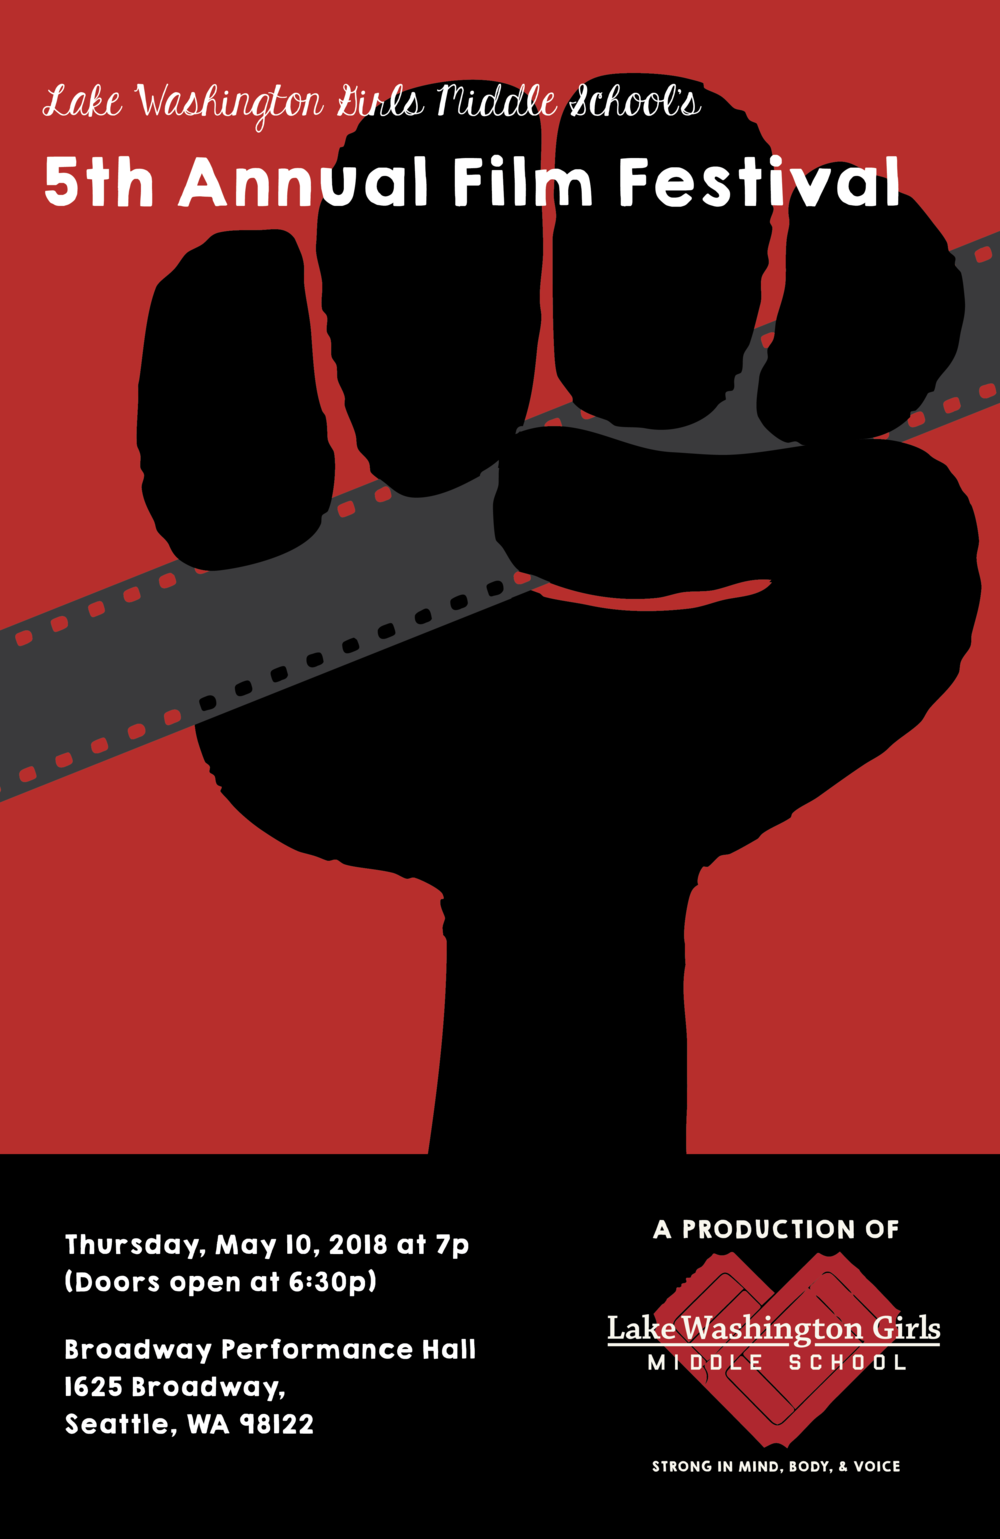 1718+Film+Festival+Poster-01-01.png